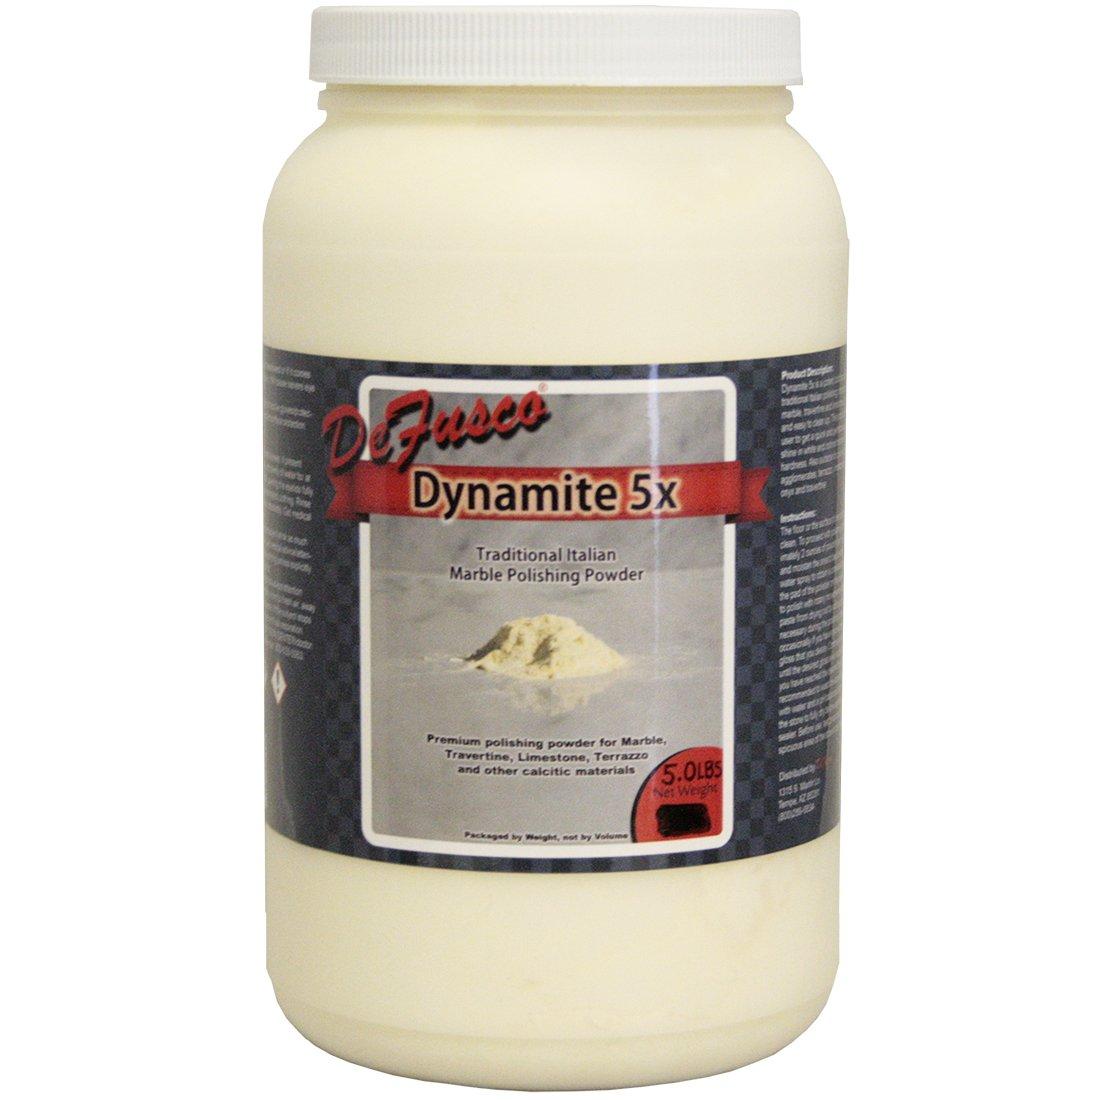 Dynamite 5x Traditional Italian Marble Polishing Powder - 5lbs